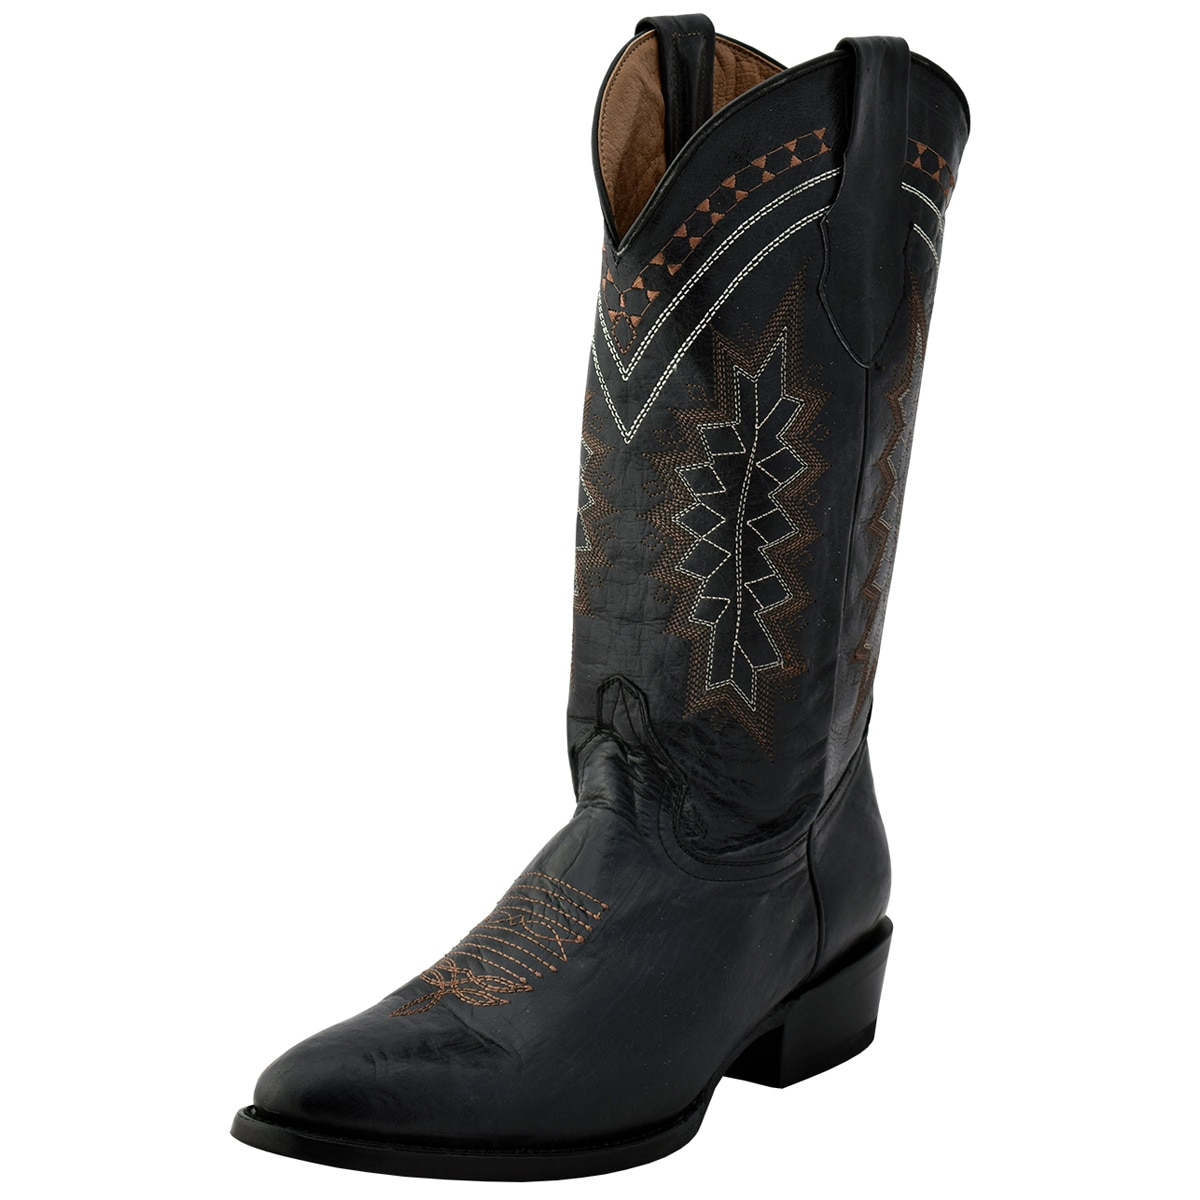 Ferrini Men's Apache Round Toe Boots